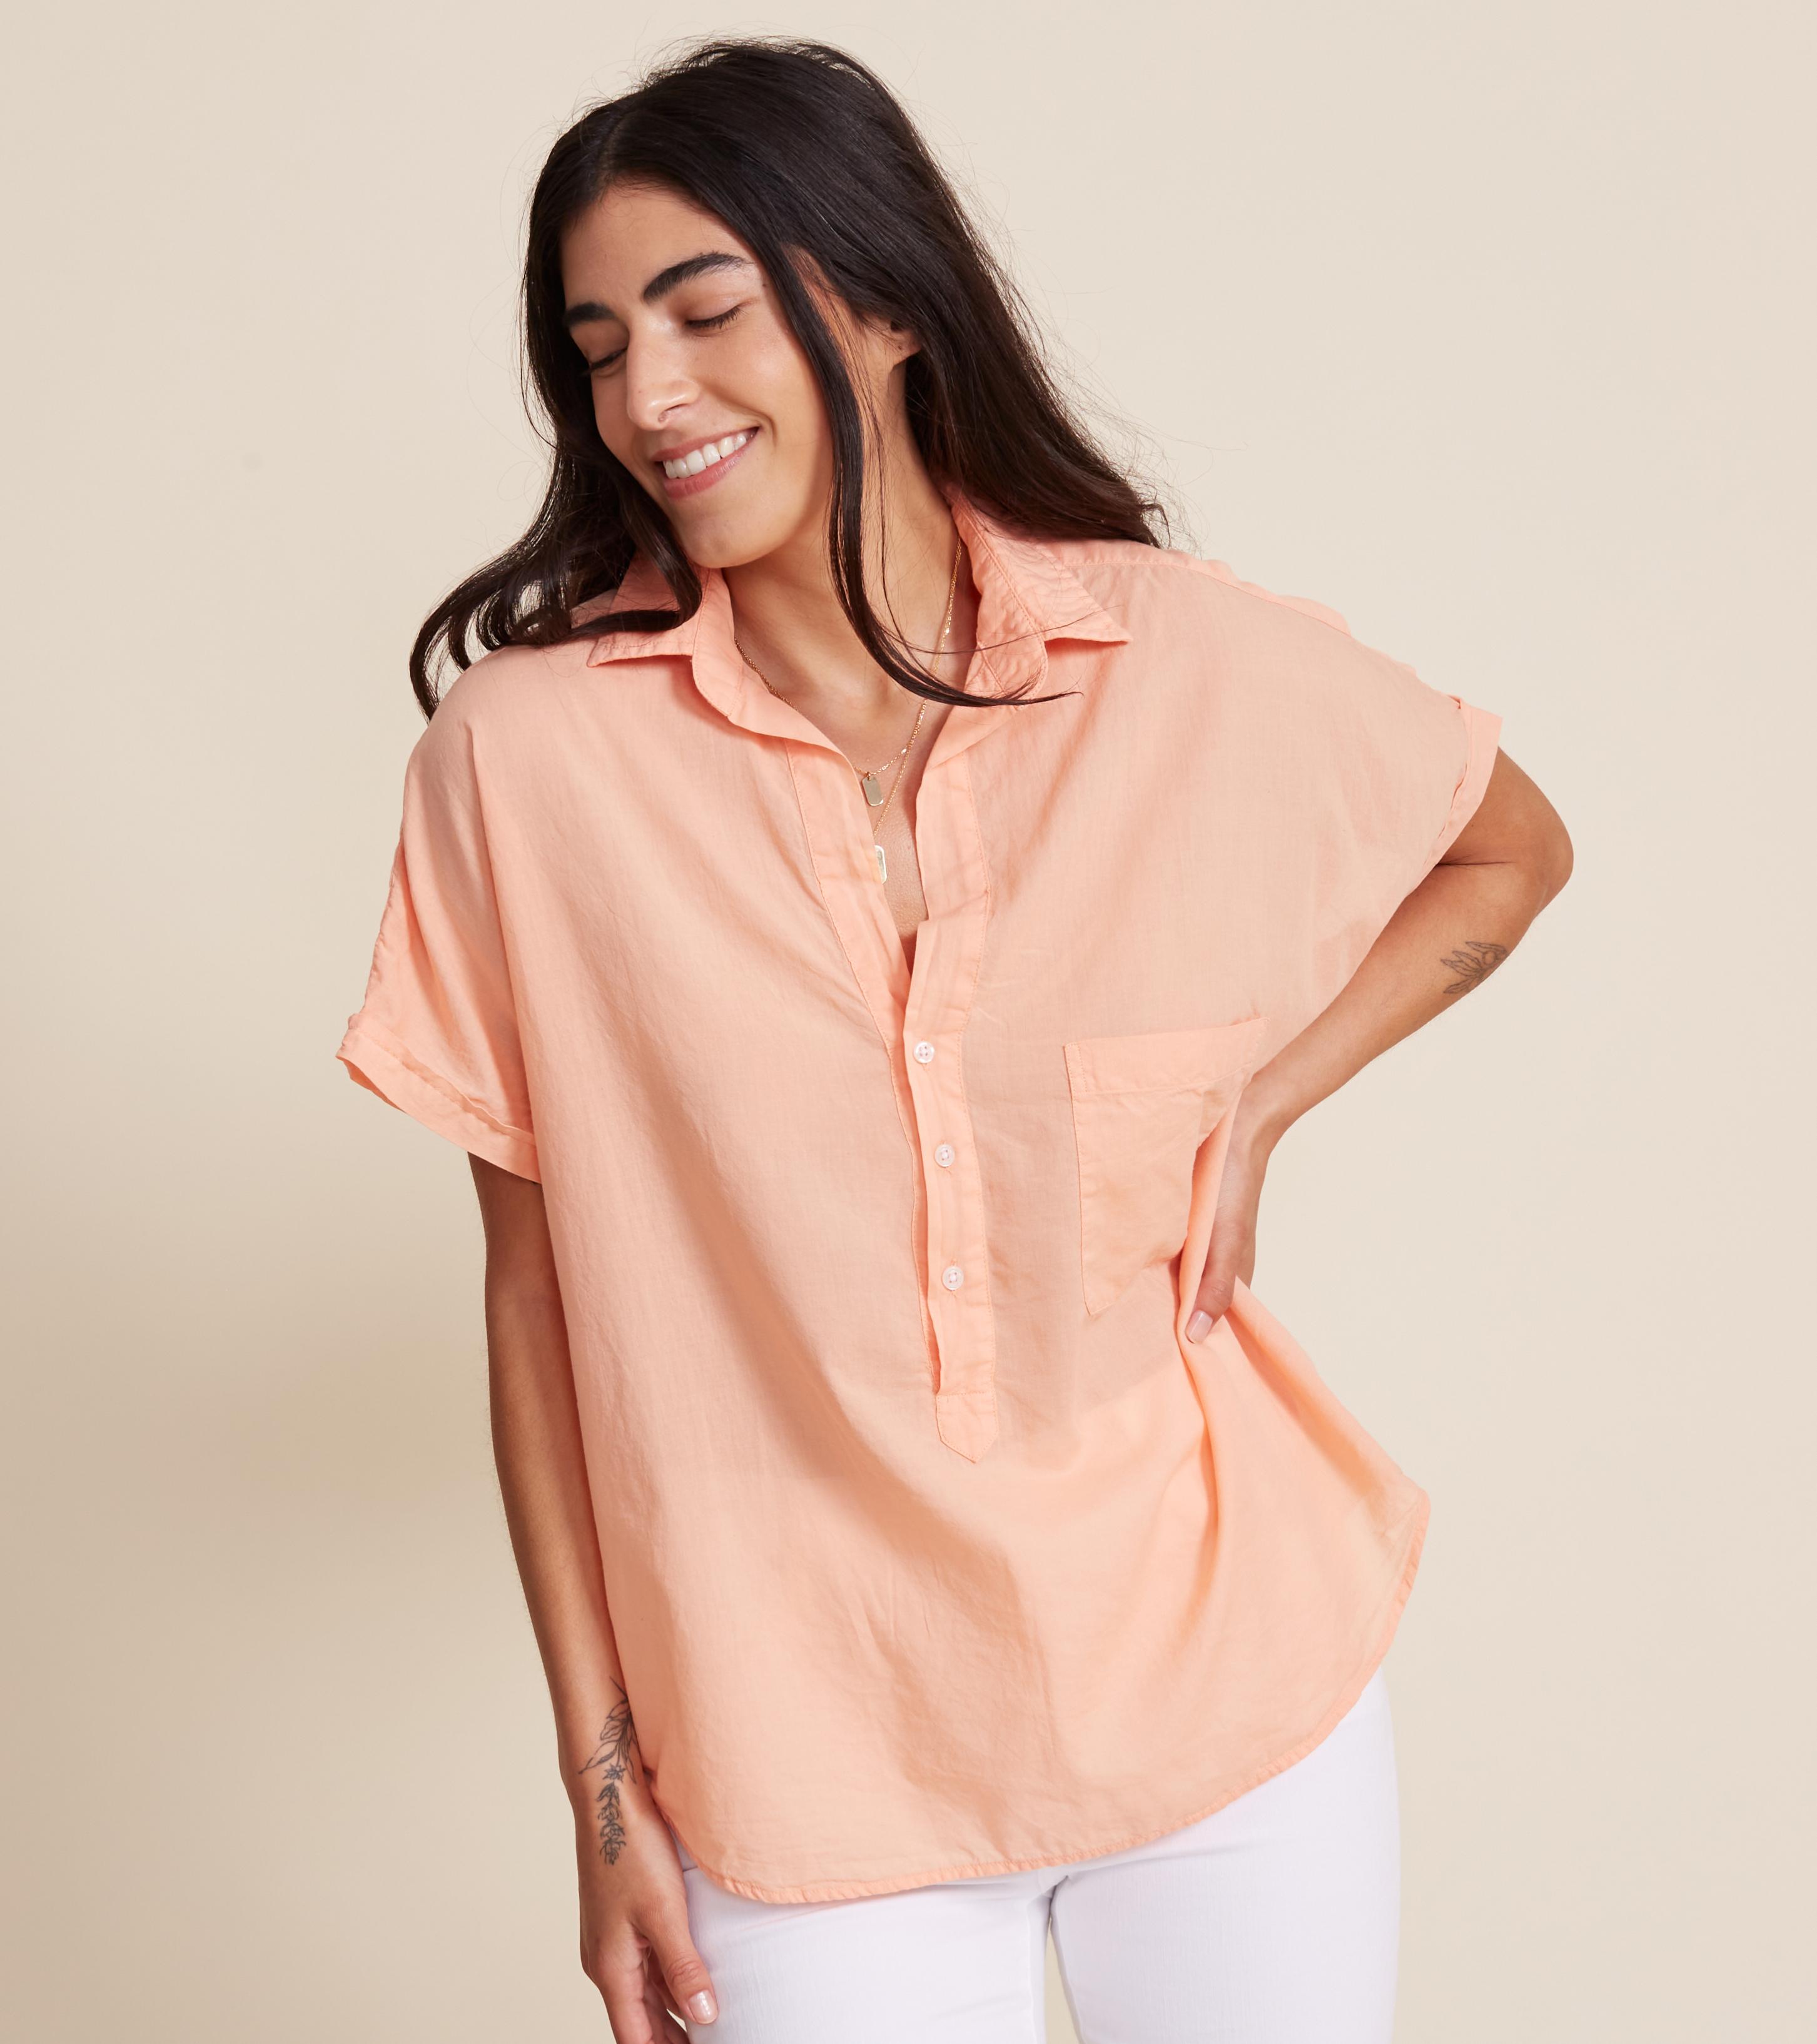 Image of The Artist Short Sleeve Shirt Cantaloupe, Tissue Cotton Final Sale